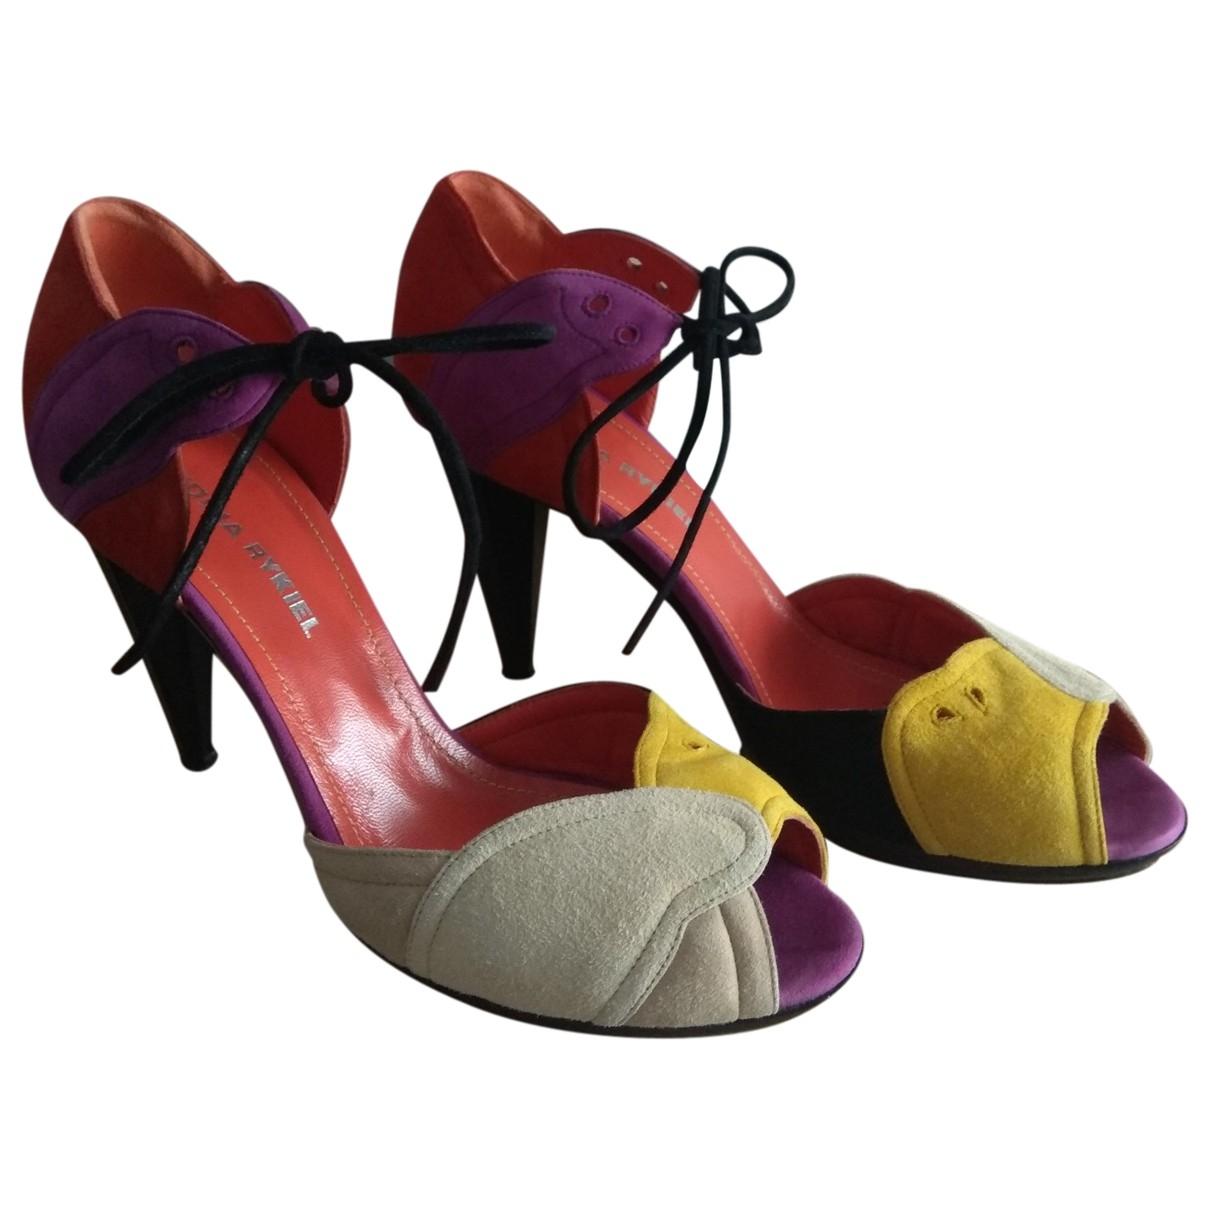 Sonia Rykiel - Sandales   pour femme en suede - multicolore